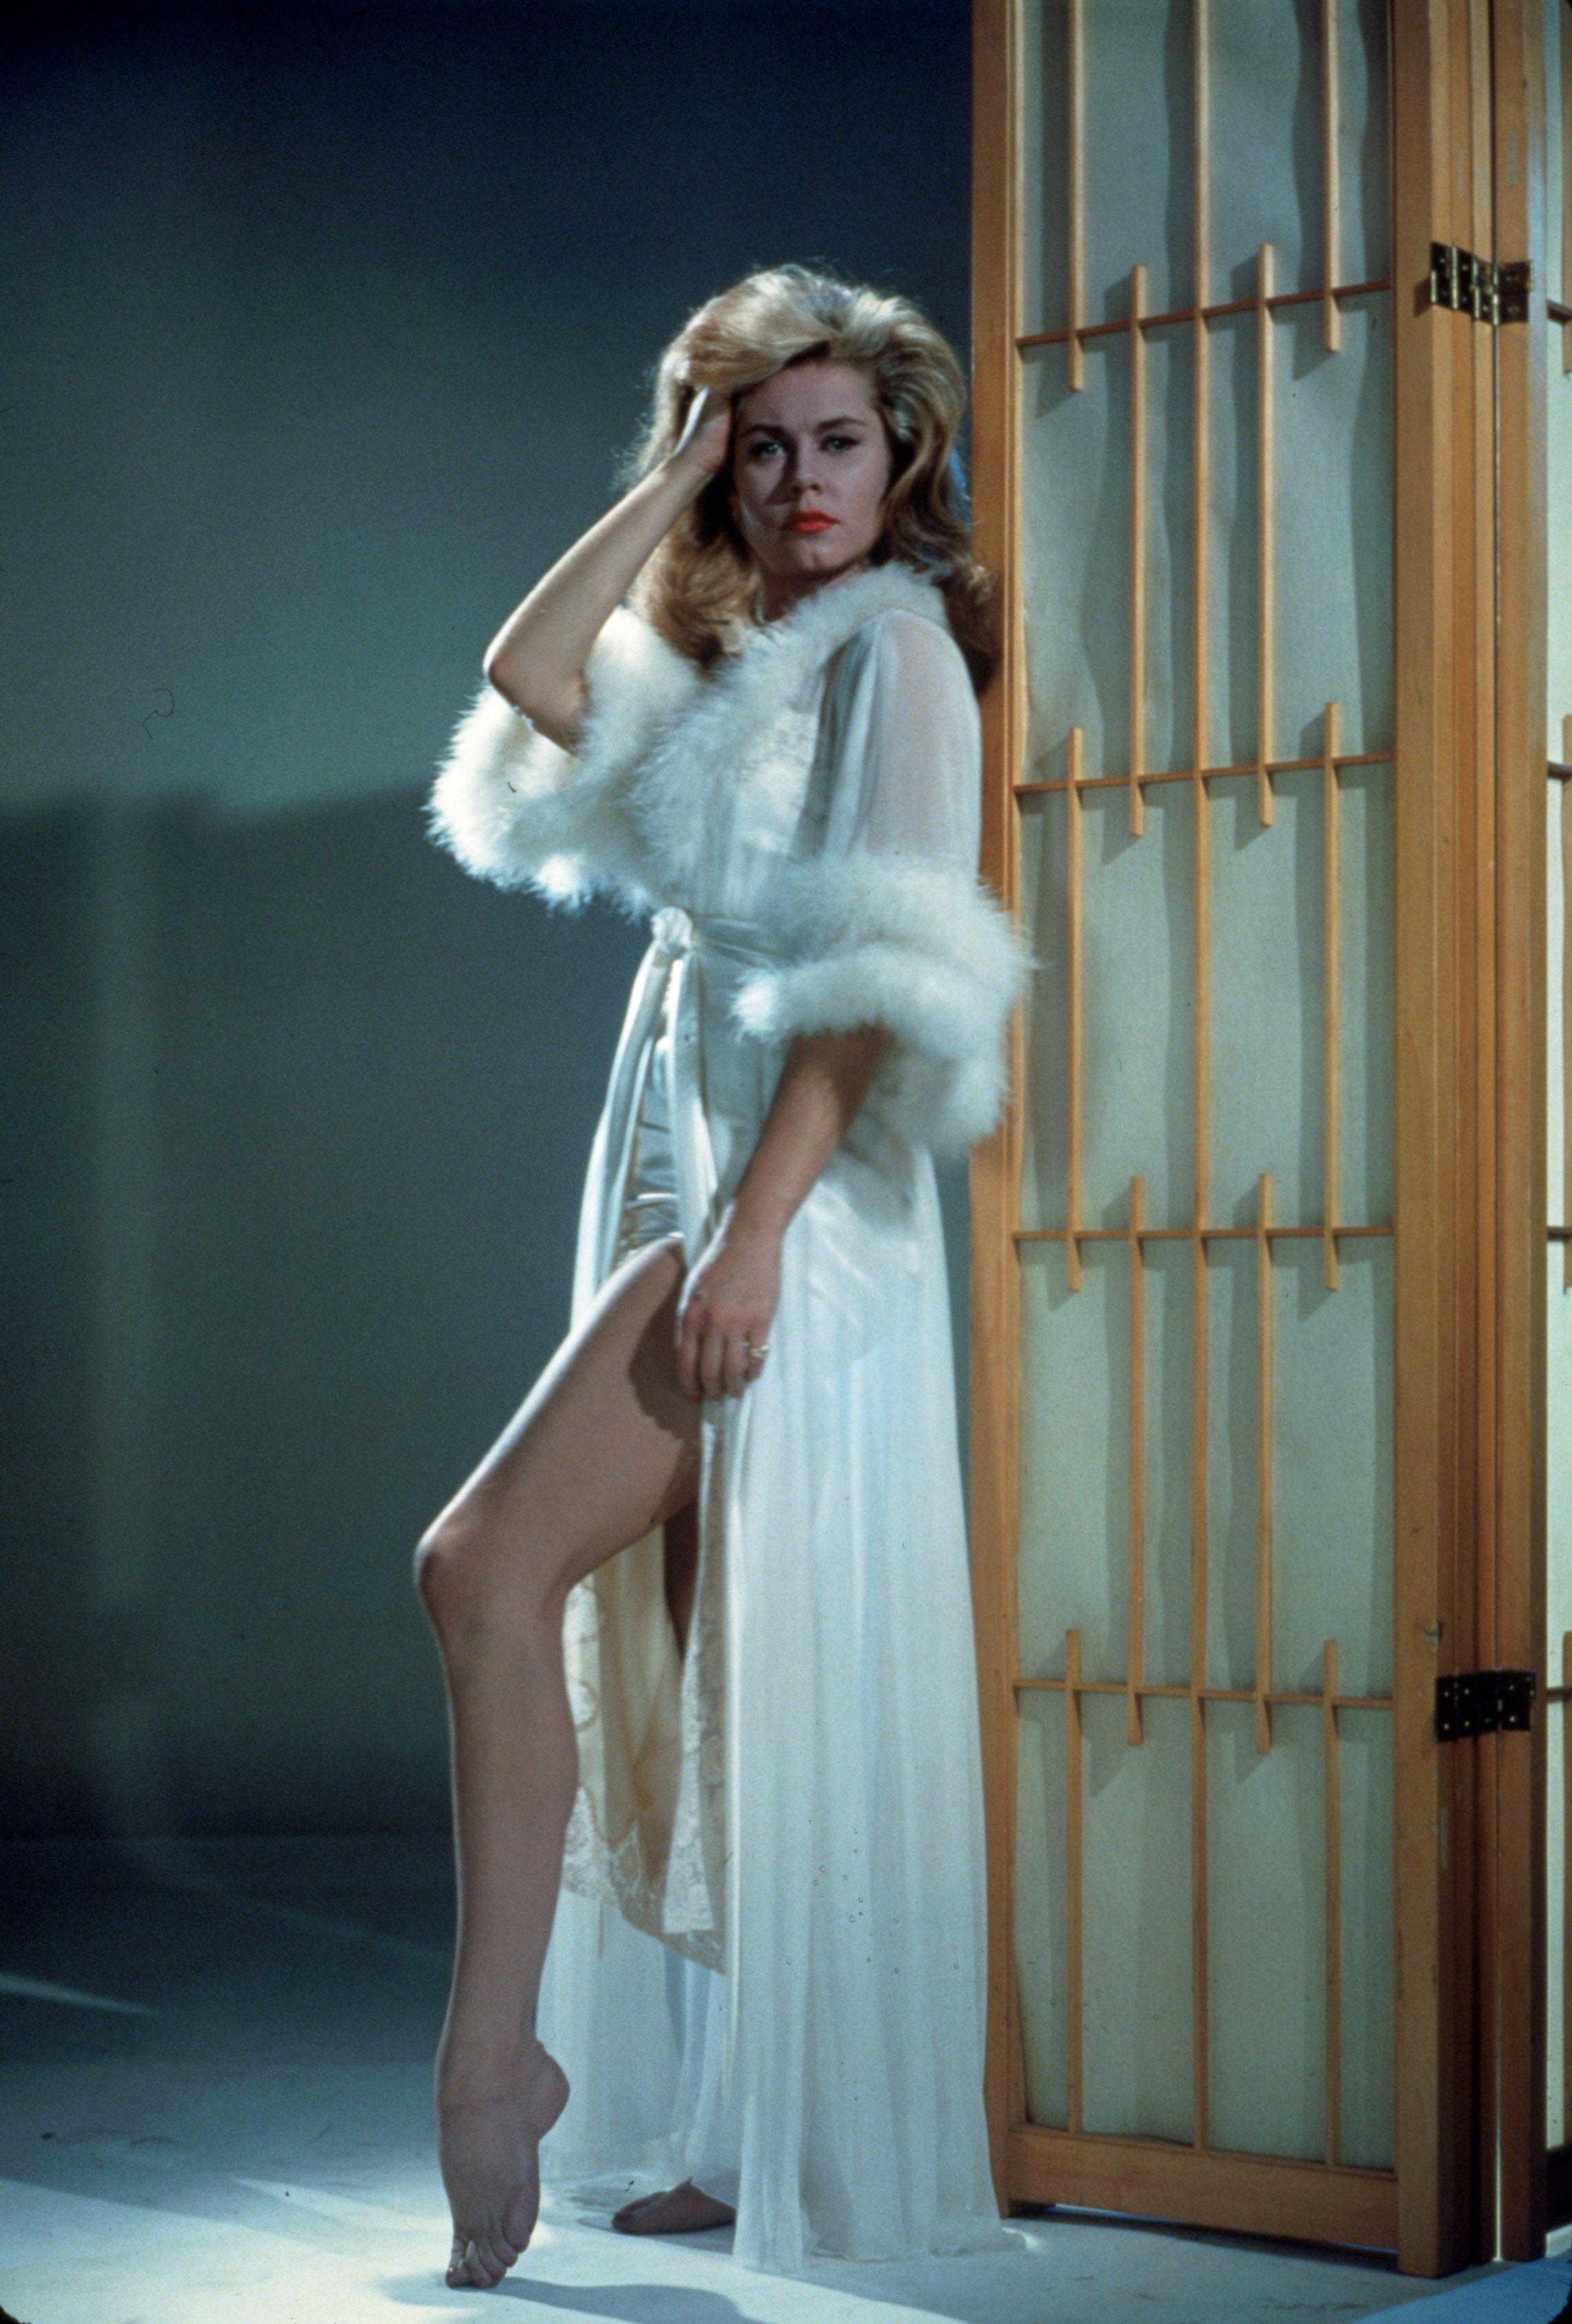 1963-elizabeth-montgomery-rexfeatures_39